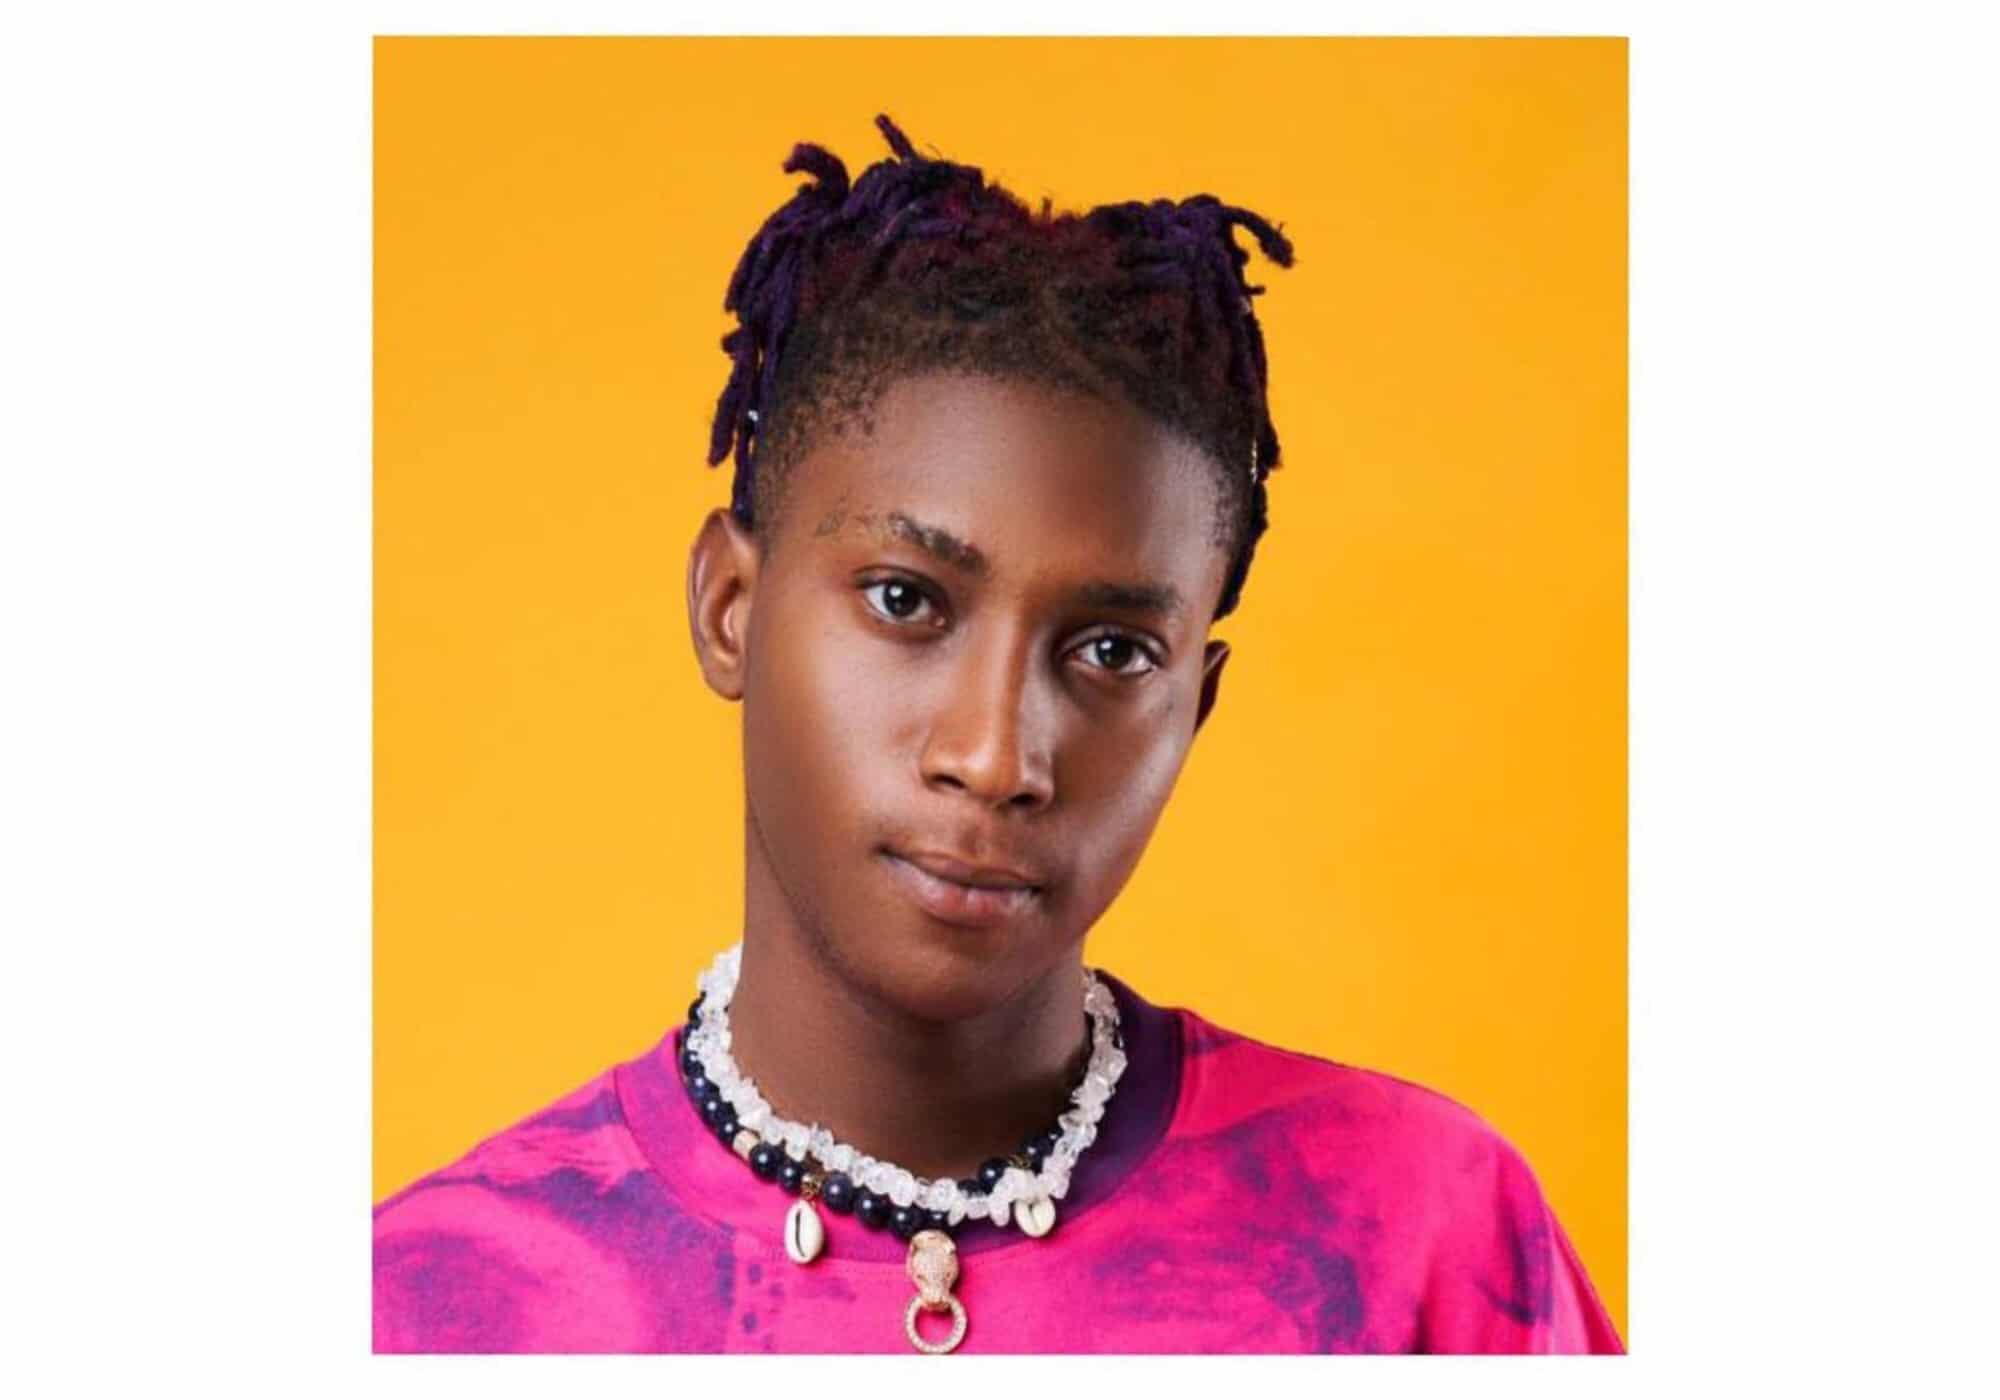 popular singer Bella Shmurda deported and banned from Ghana